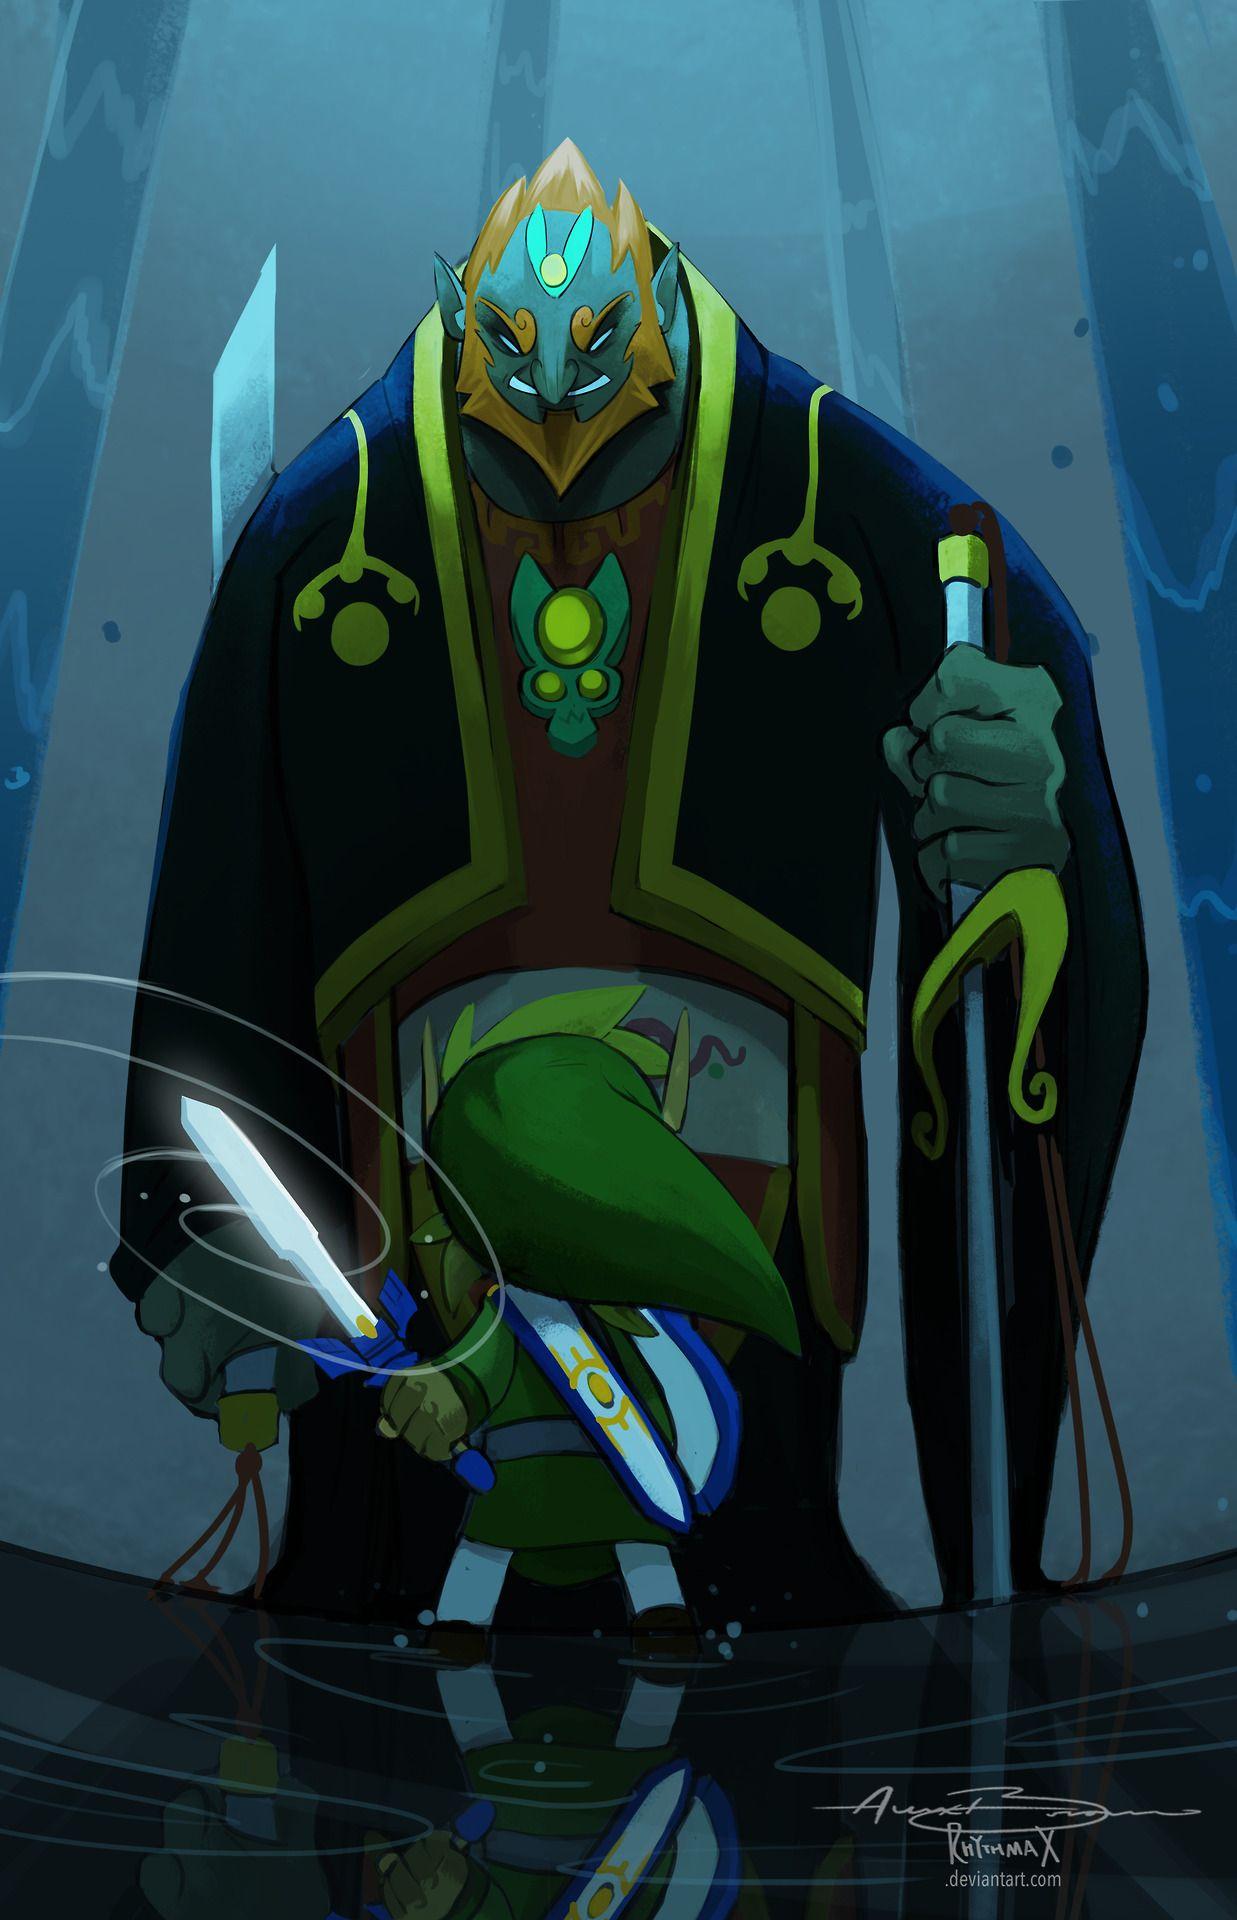 The Wind Waker | Link vs Ganondorf by Alexander Braun